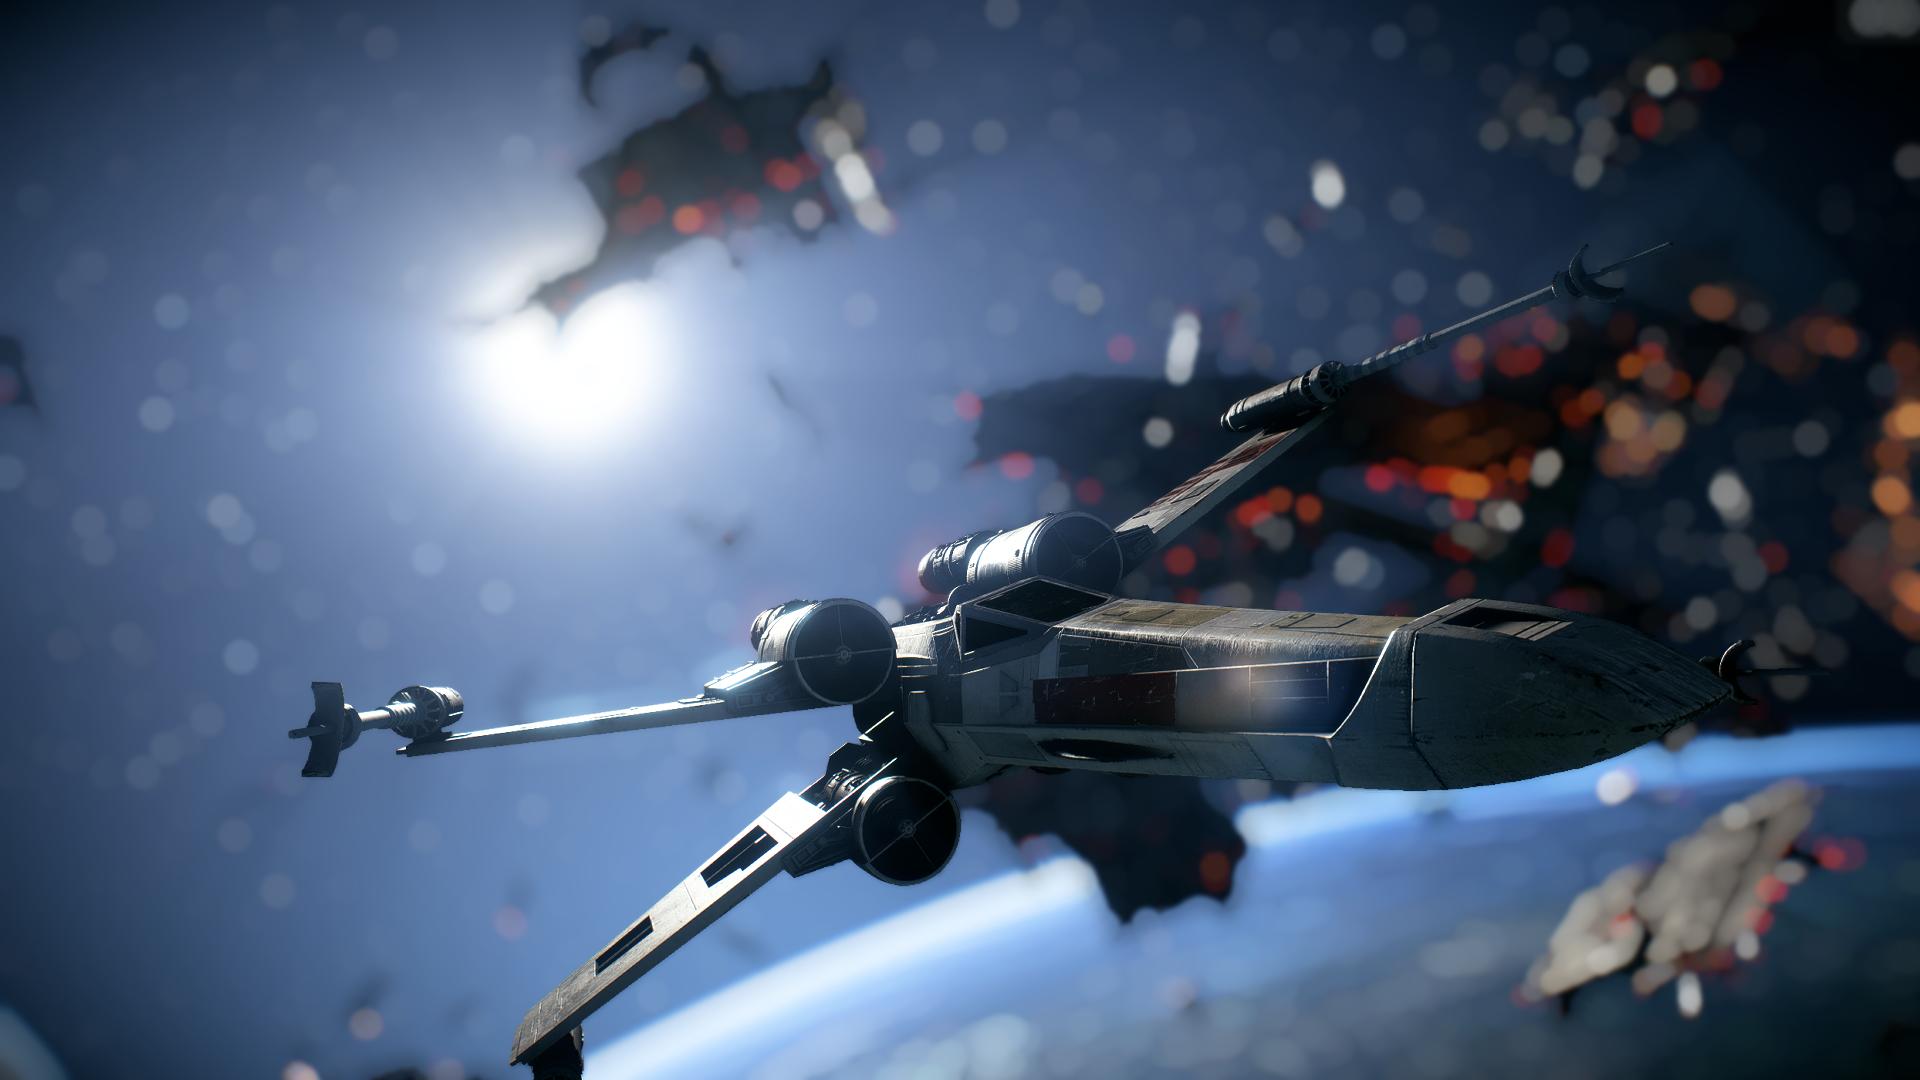 star-wars-battlefront-ii-2017-screenshot-2020.07.26-13.13.56.09